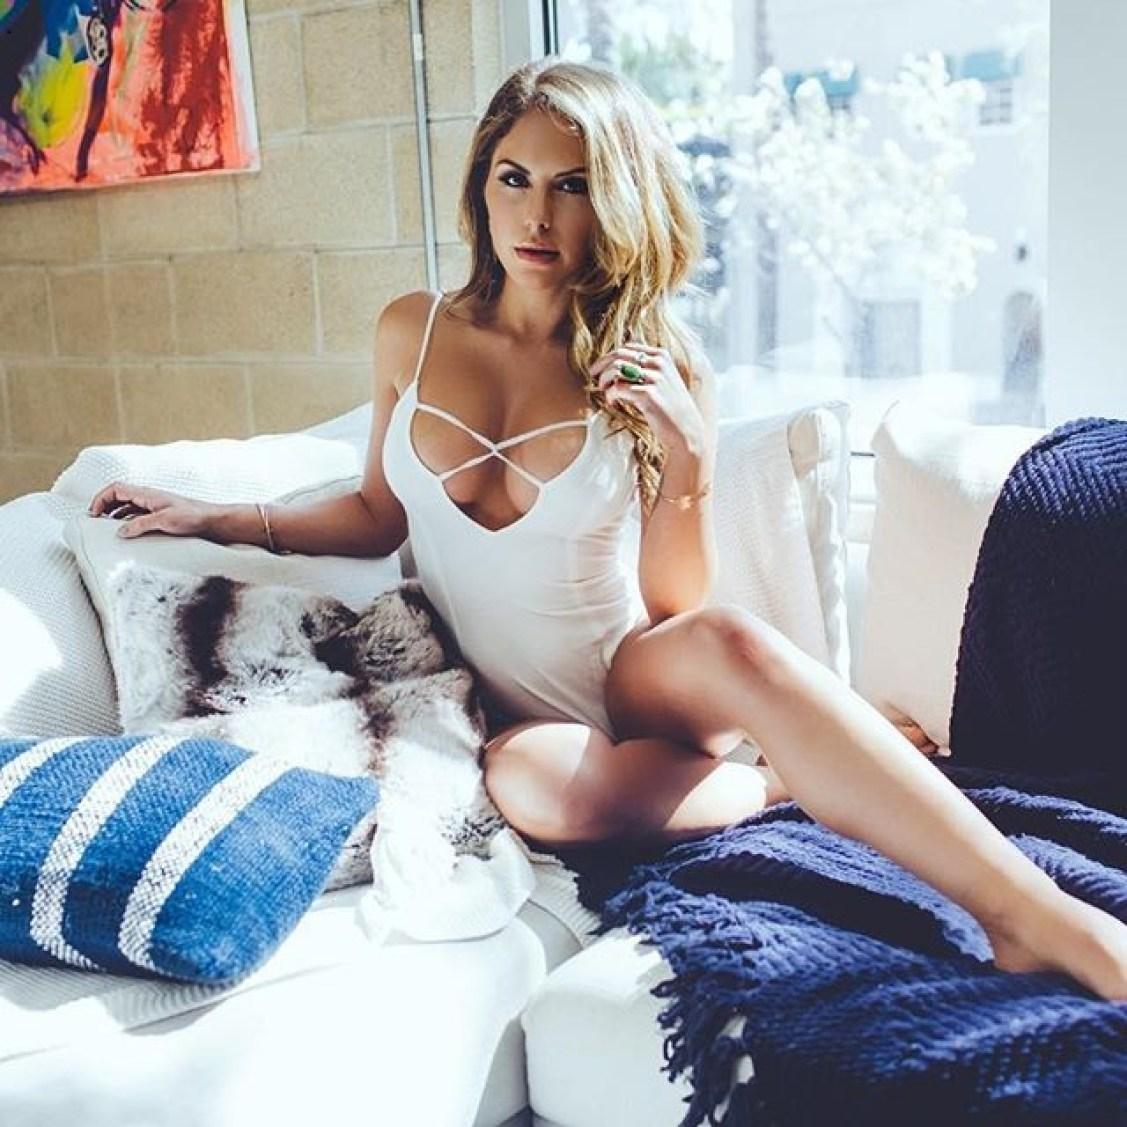 brittney palmer hot model instagram